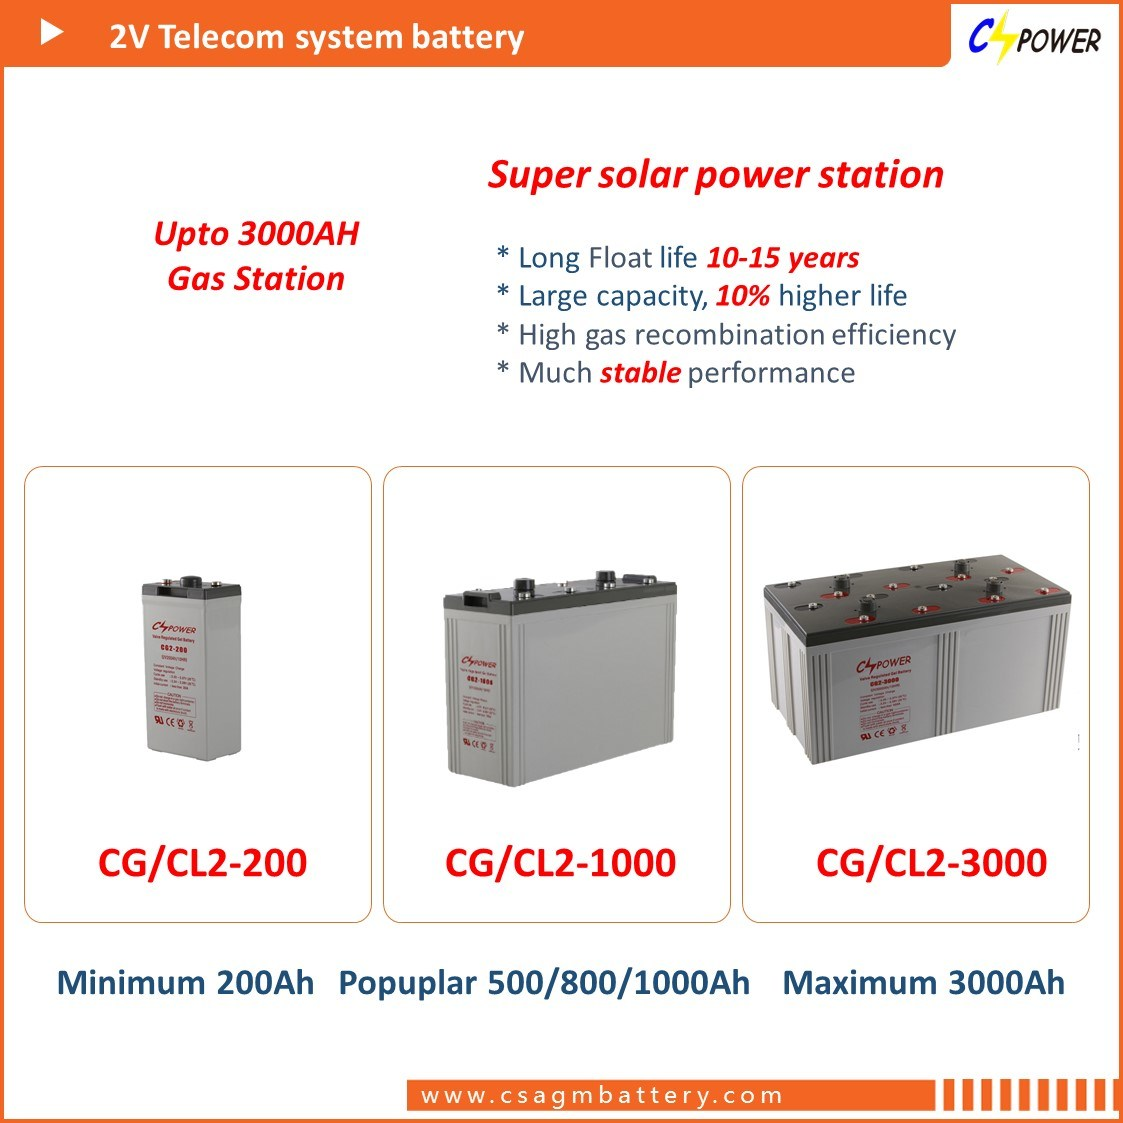 Cspower 2V 600ah Power Storage Gel Battery - Solar Energy System